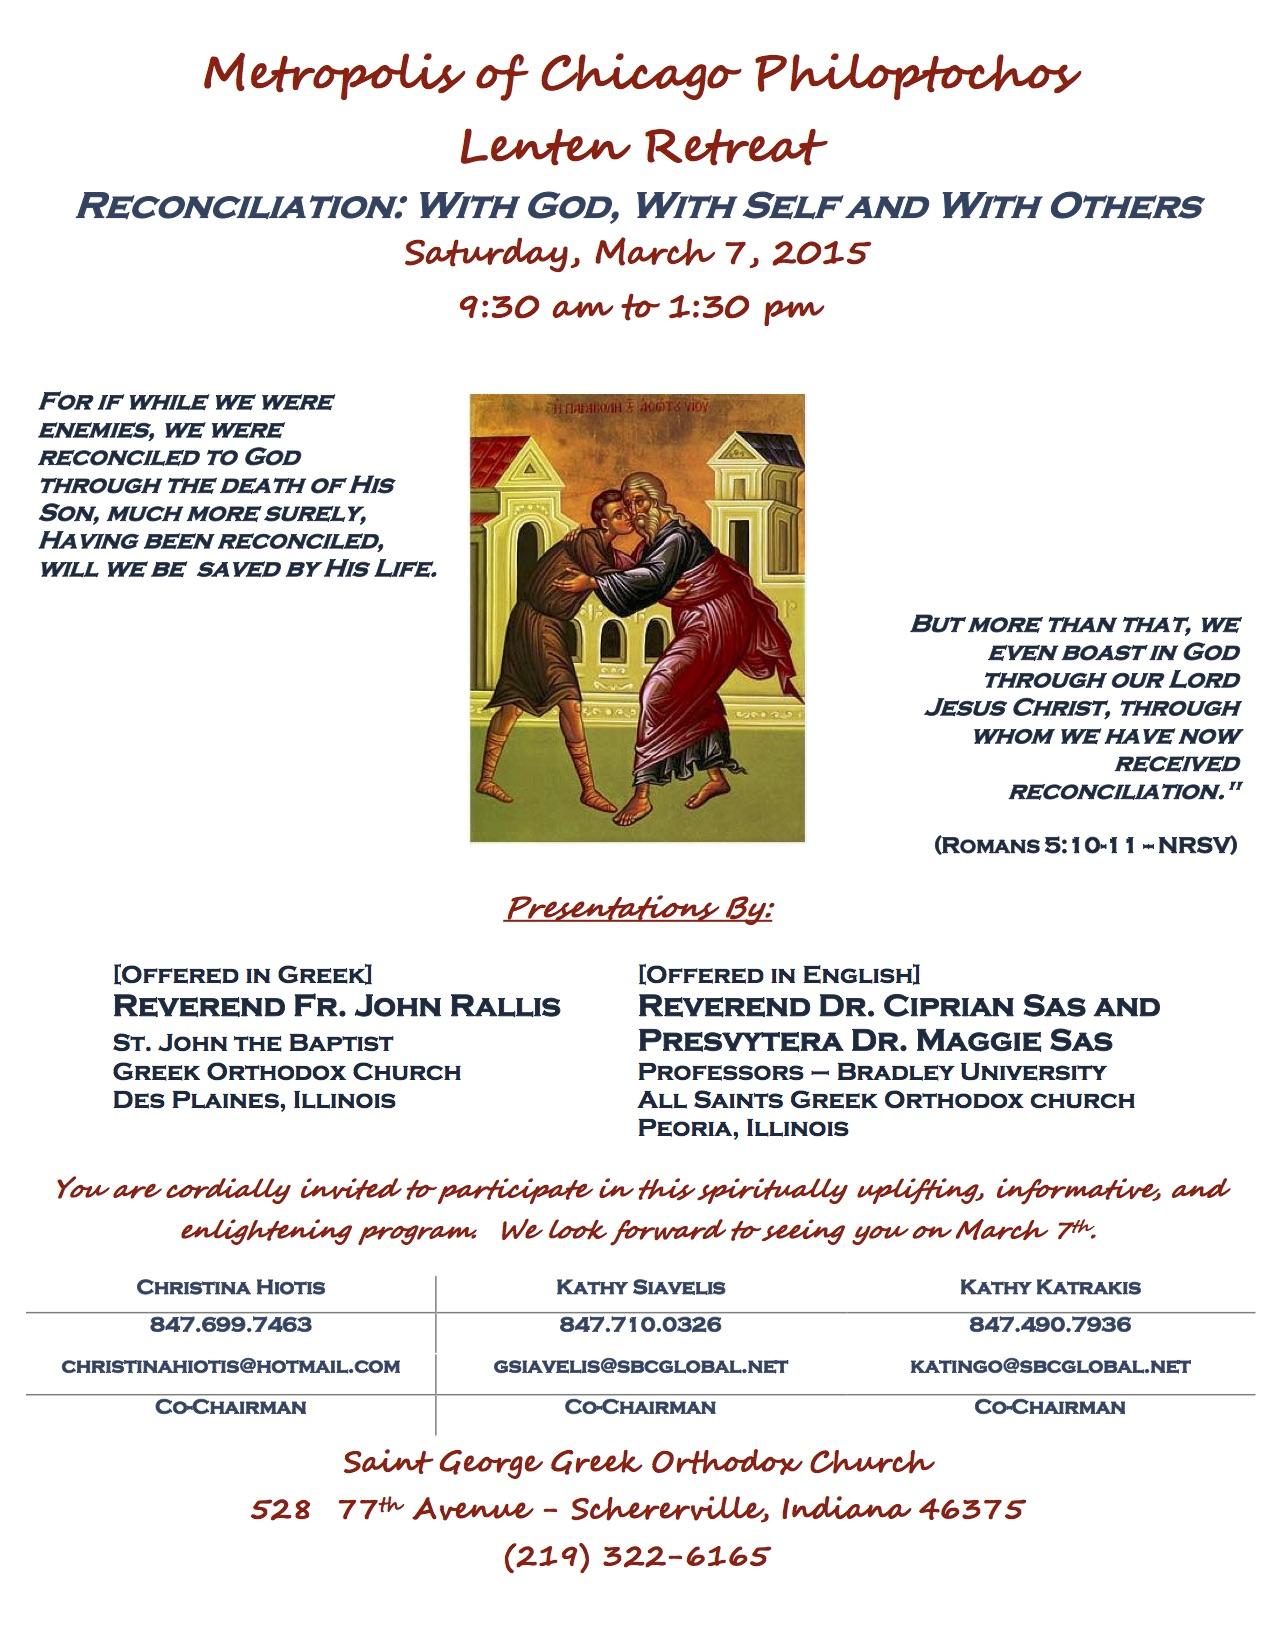 Metropolis of Chicago Philoptochos Lenten Retreat